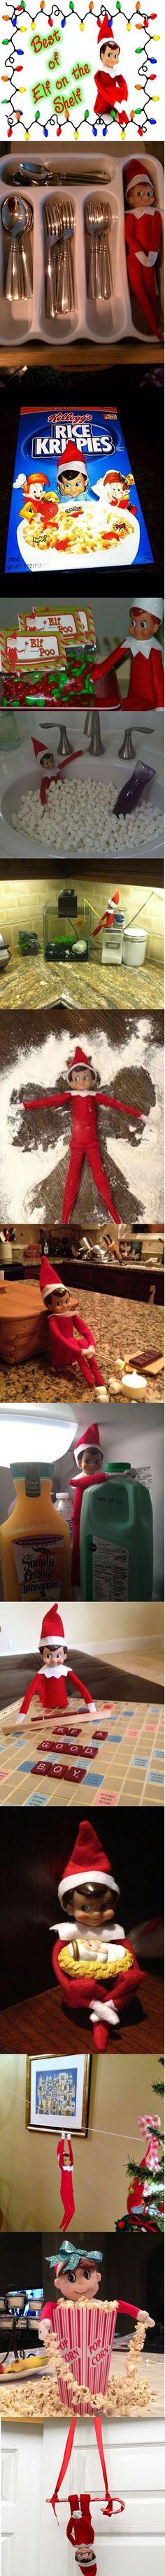 Best of Elf on the Shelf ;):